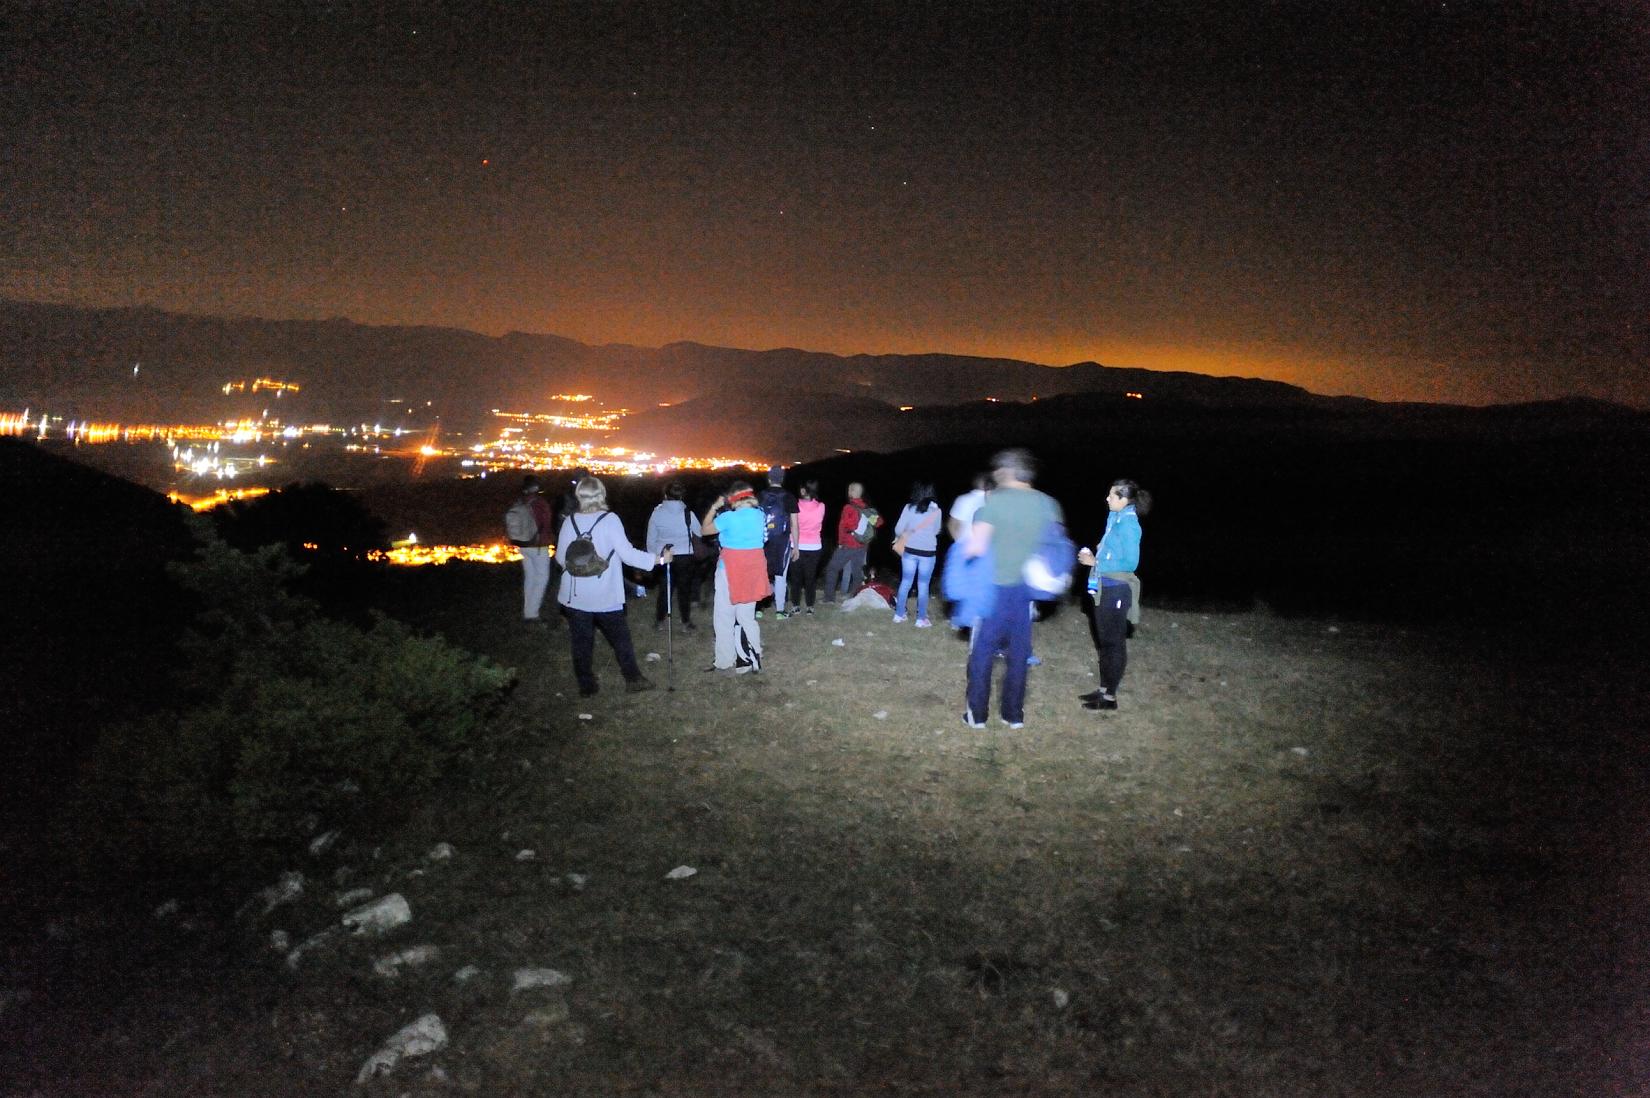 Escursione astronomica notturna guidata